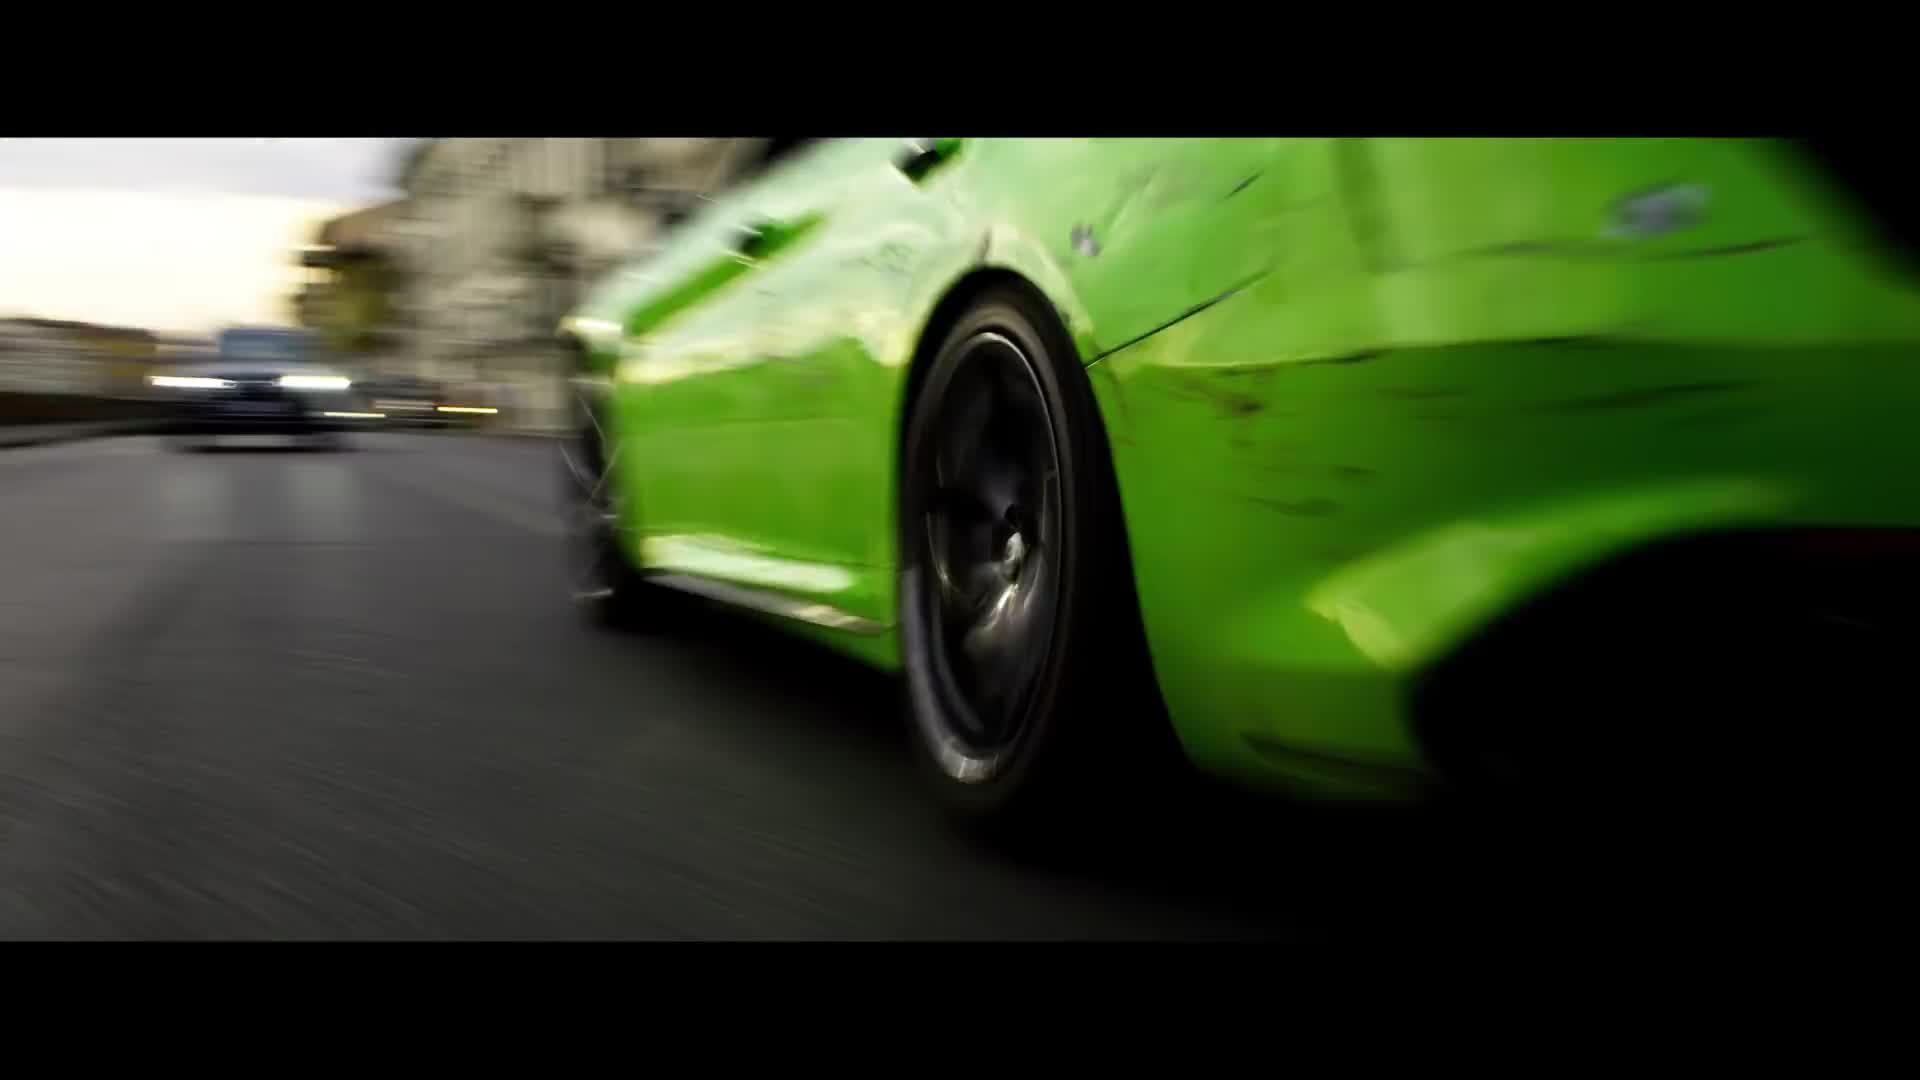 6 Underground - Official Trailer #2 [HD] screen capture